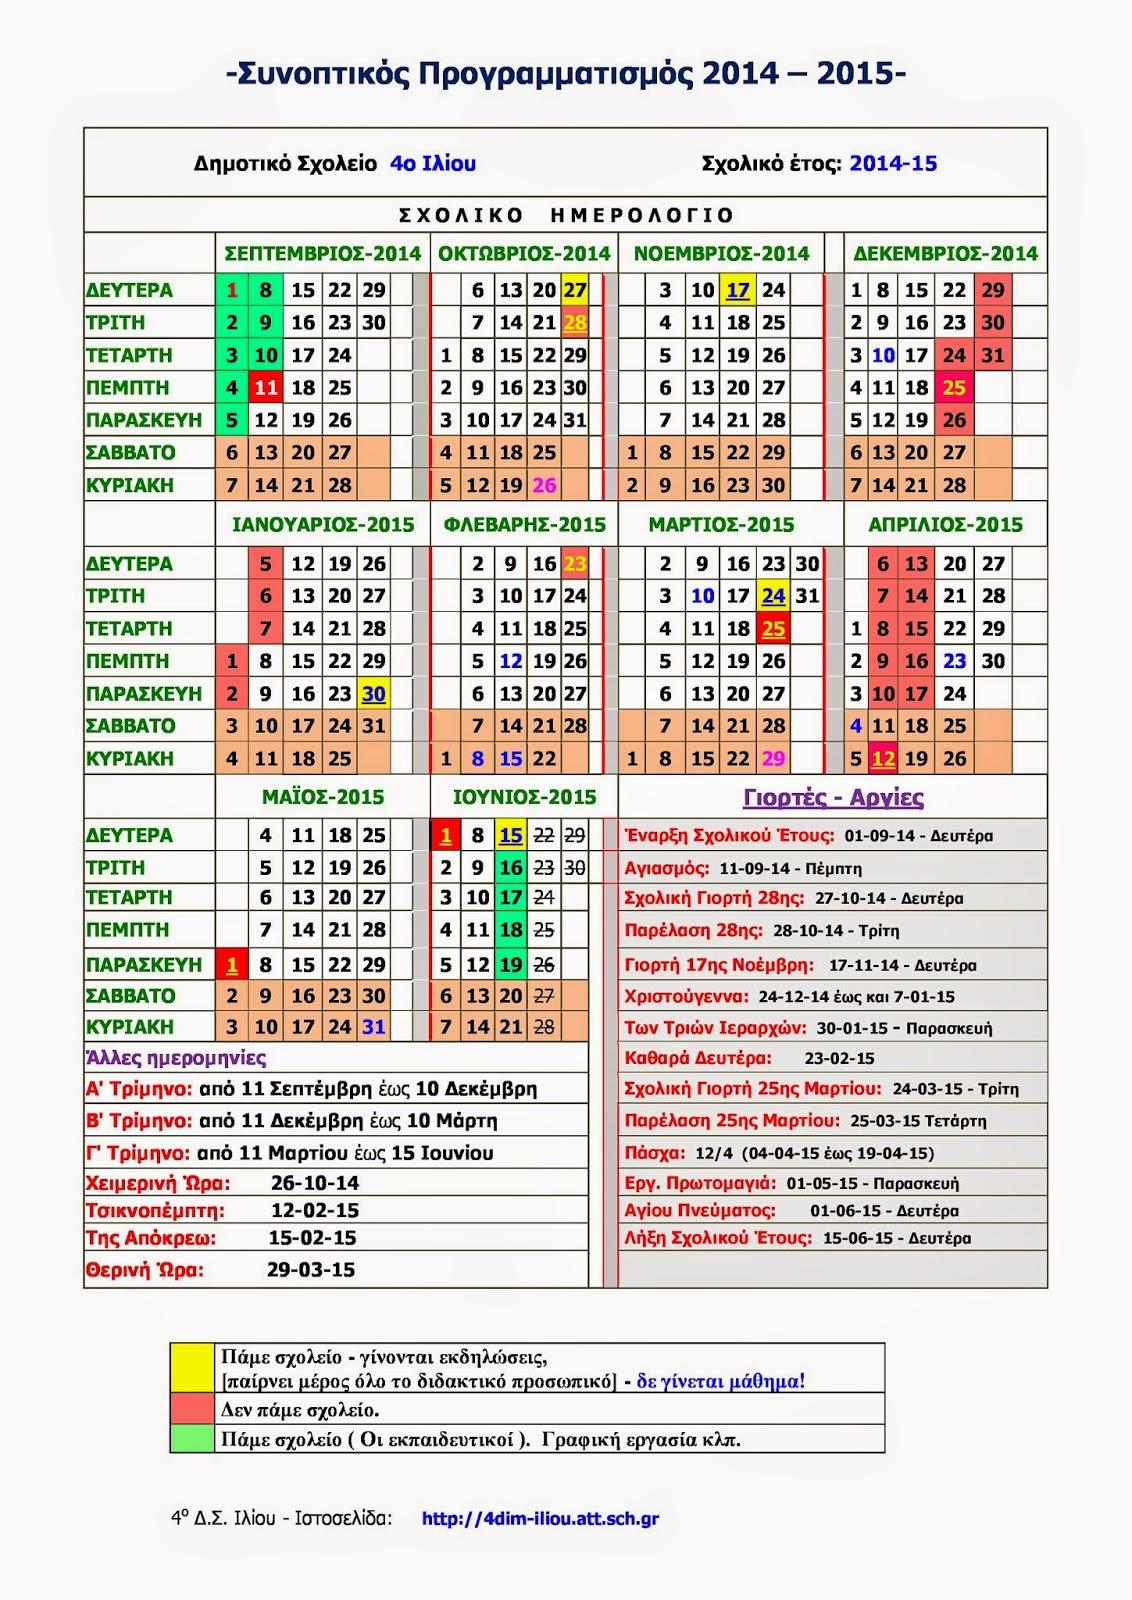 http://4dim-iliou.att.sch.gr/programmatismos/2014-2015-programmatismos/programmatismos-4oy-ilioy-2014-15.pdf